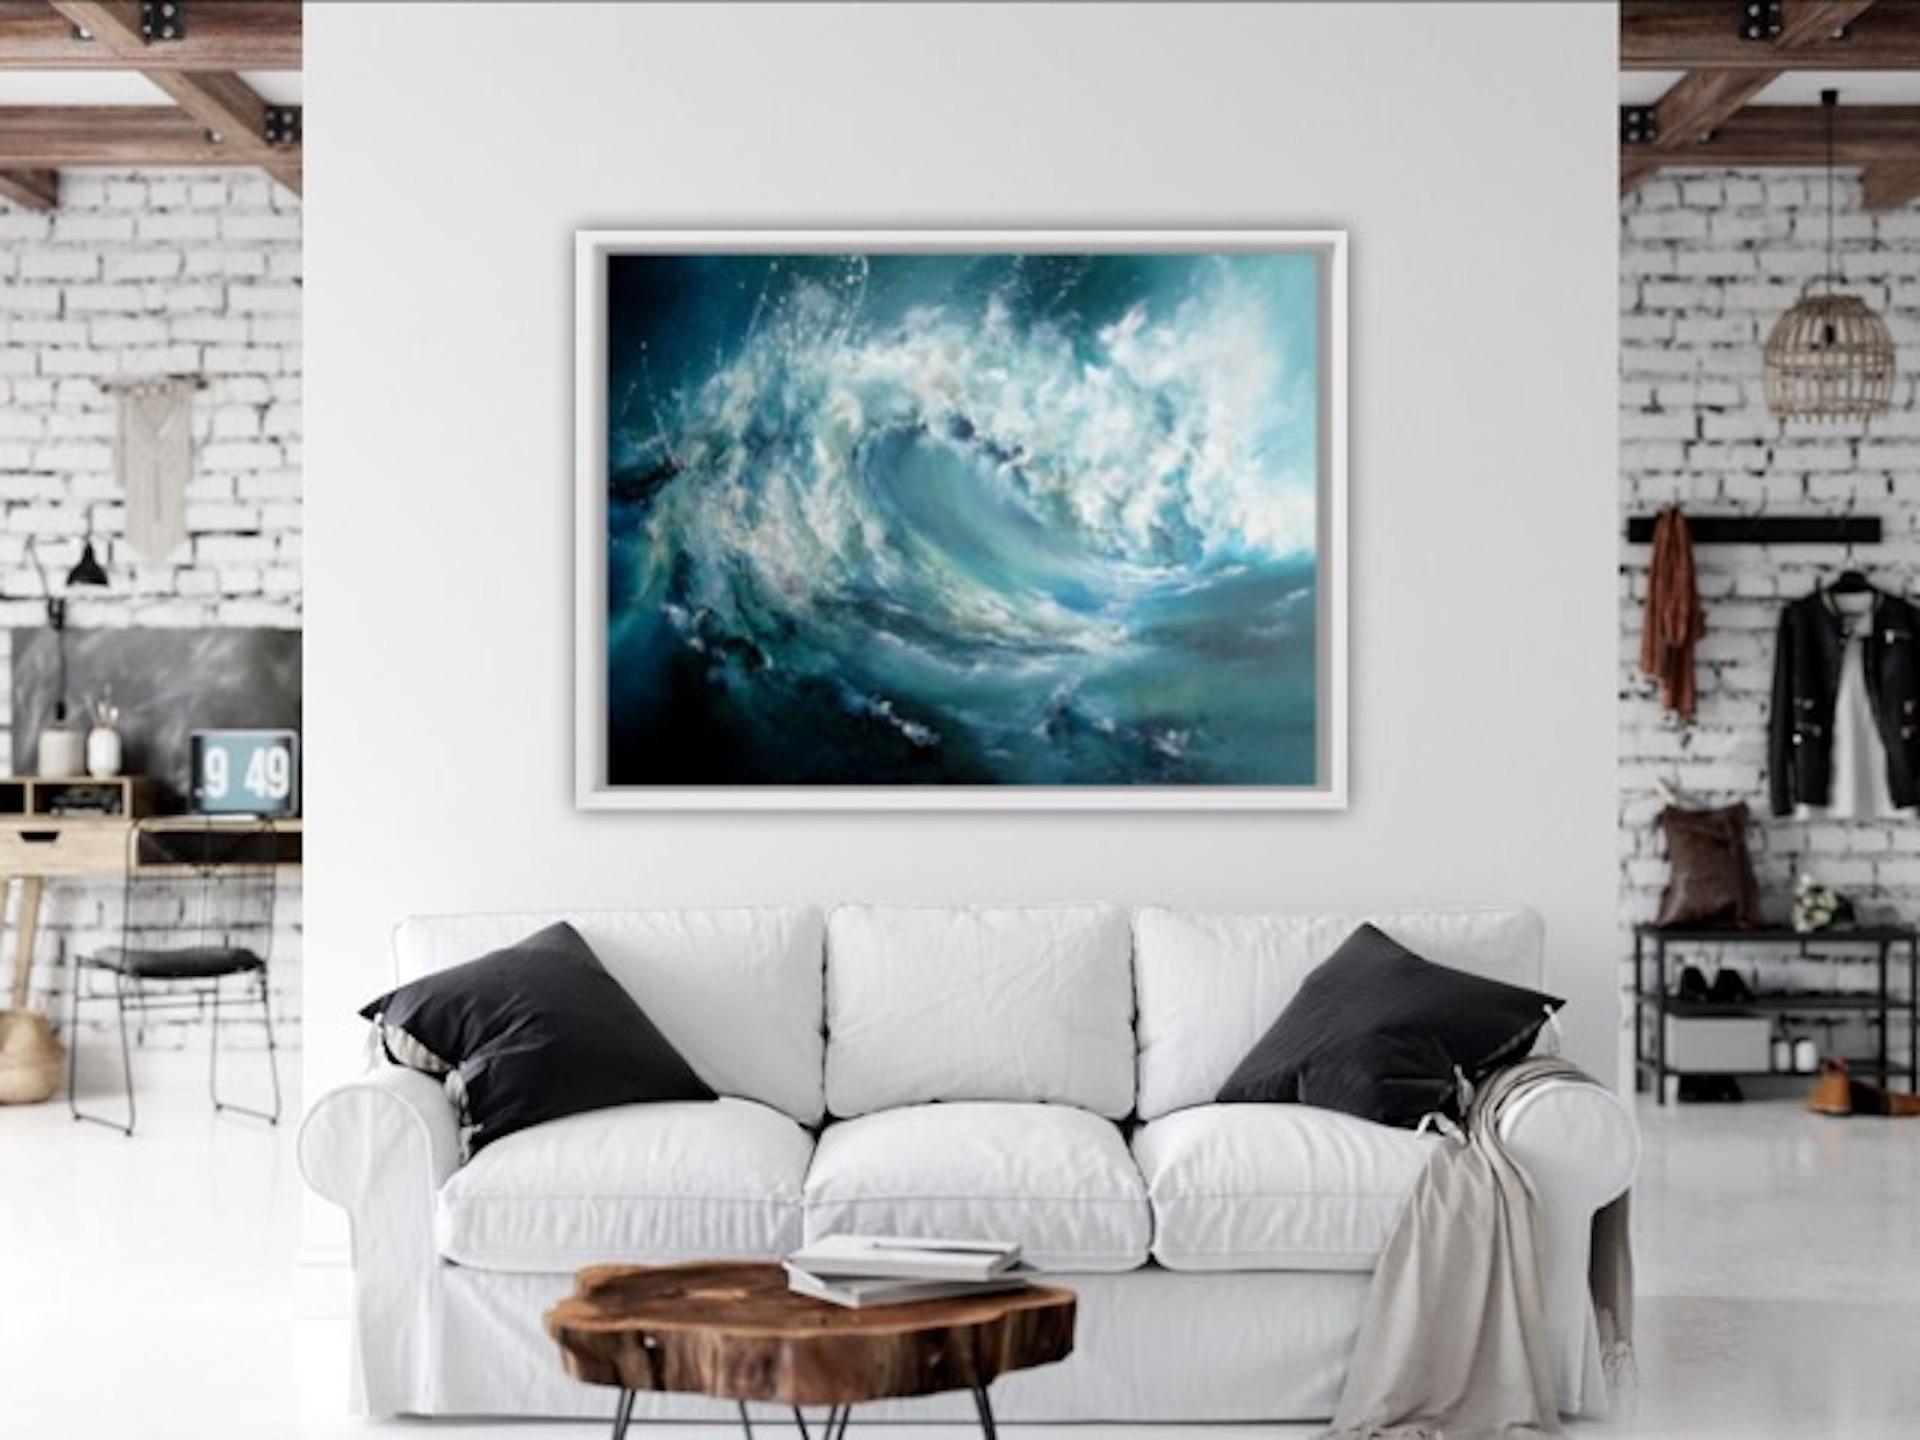 Alison Johnson, The Break, Sea Oil Painting, Original Textured Painting